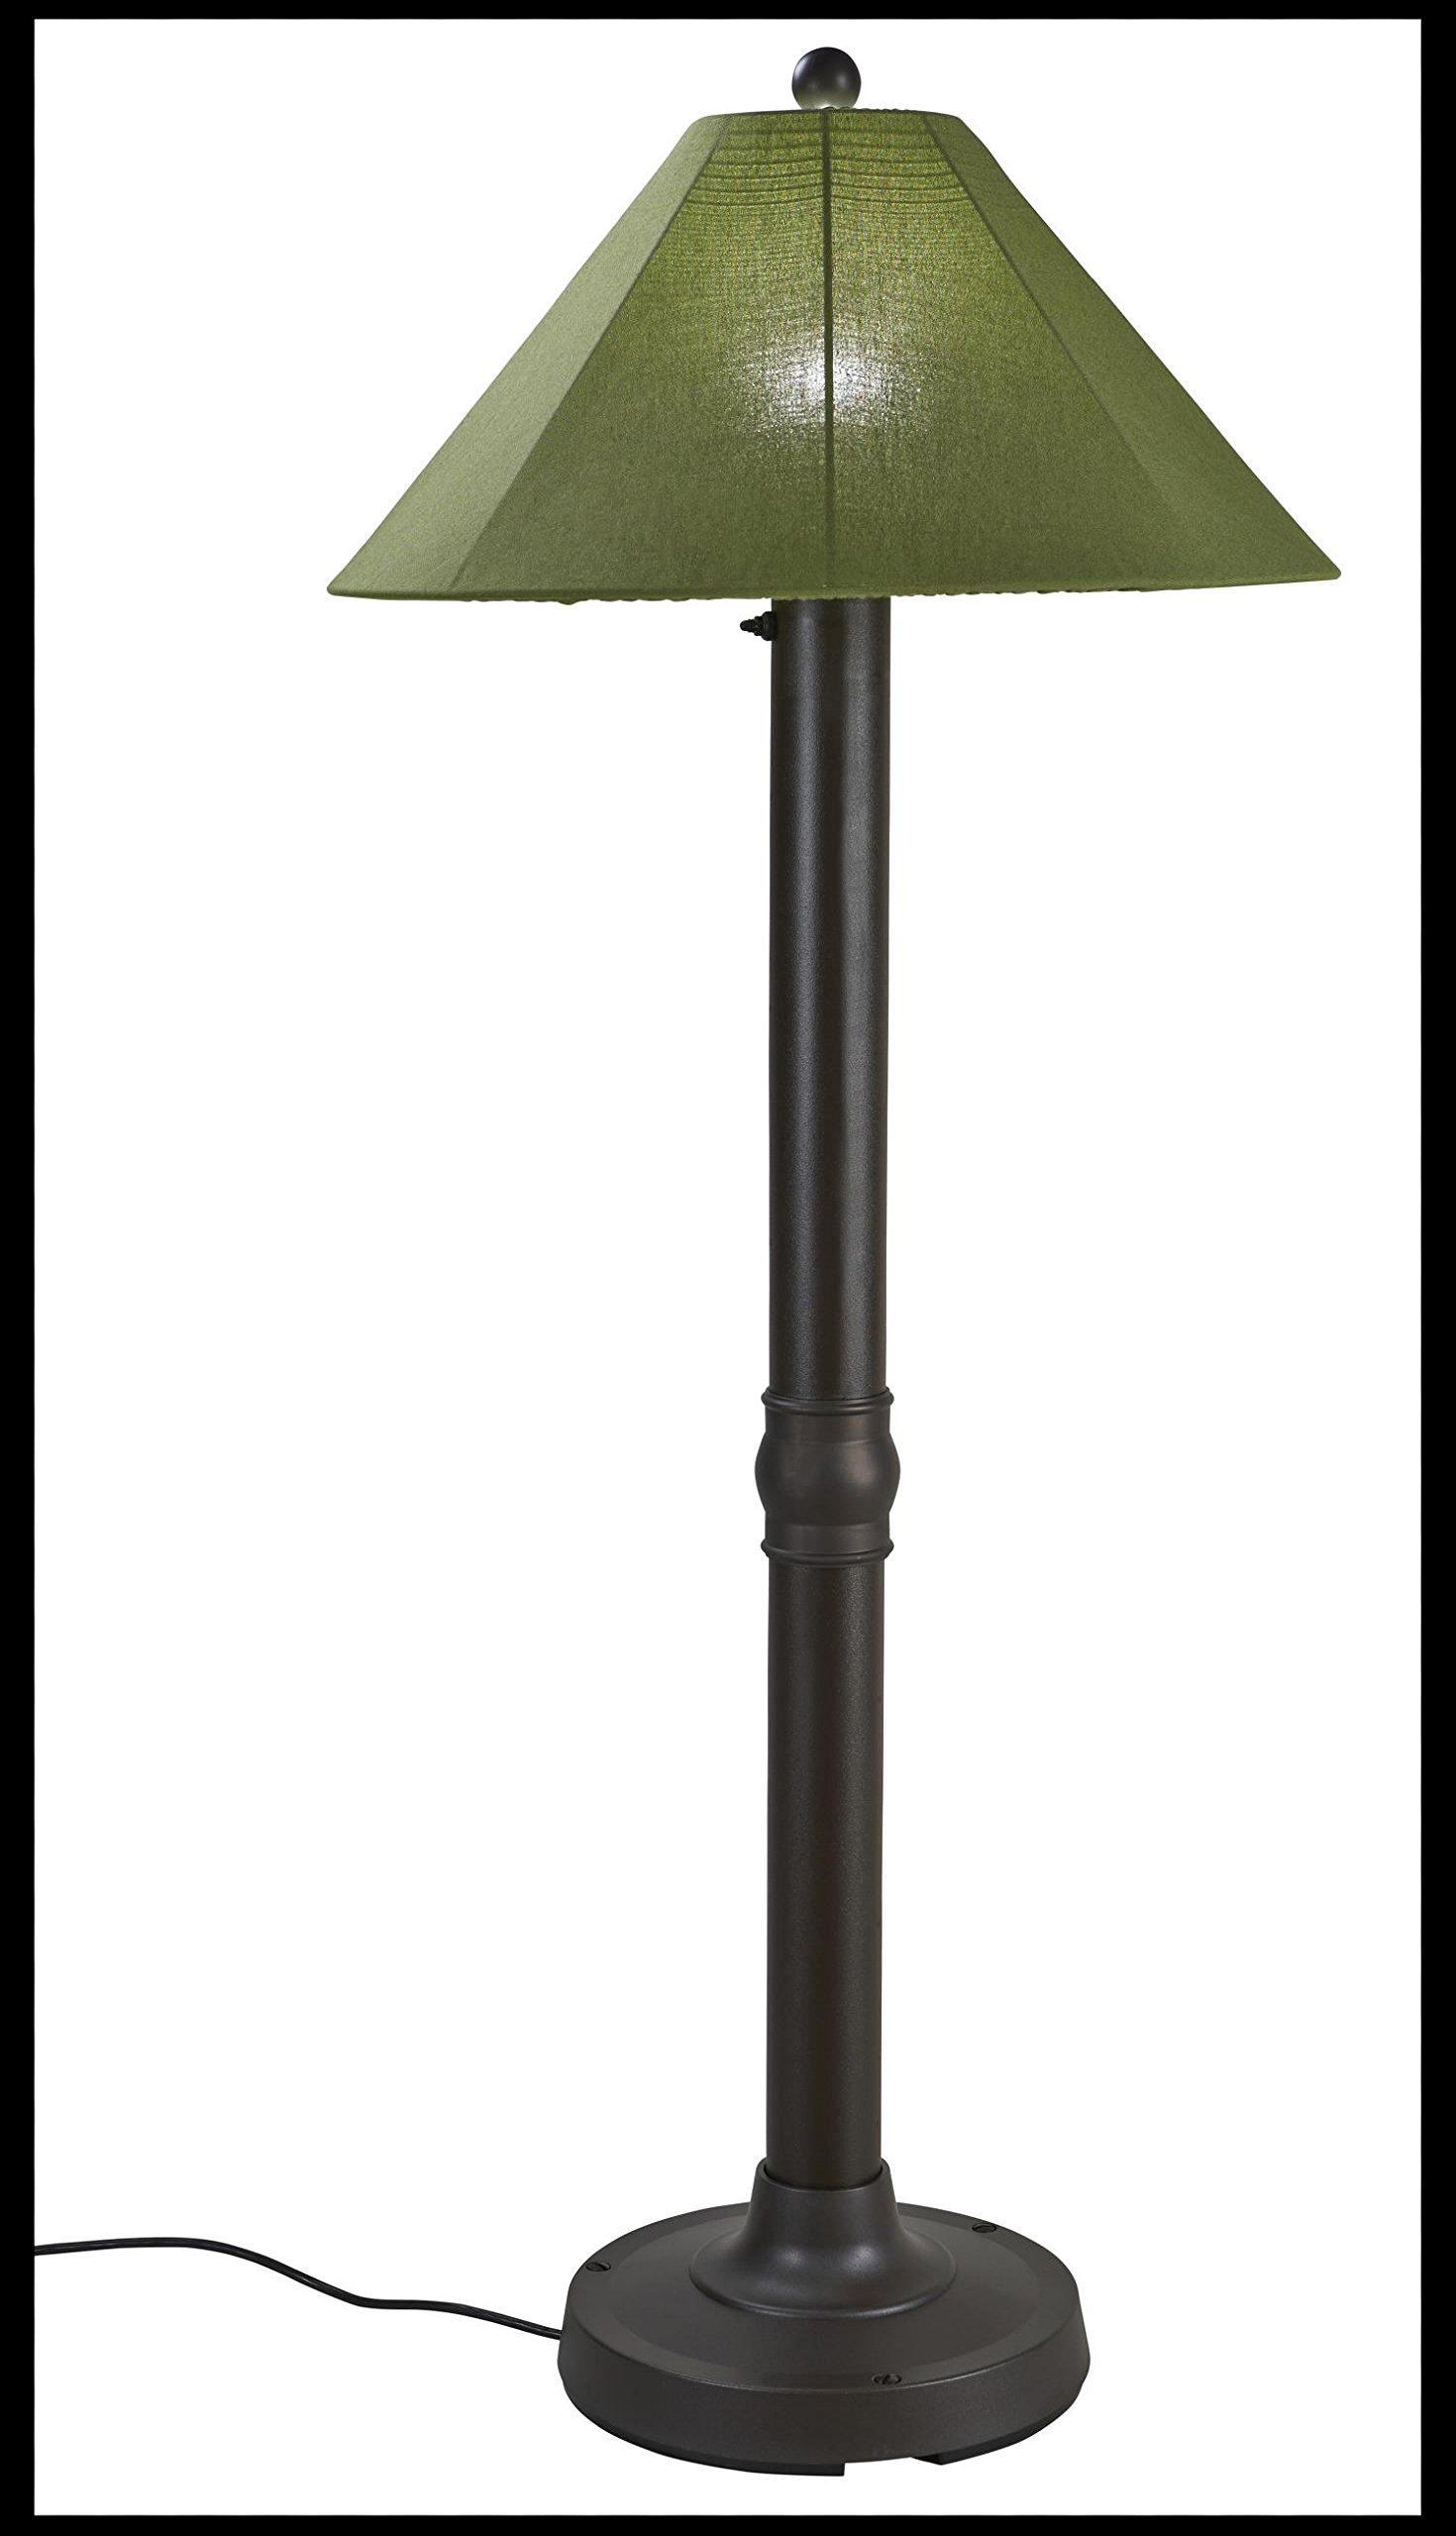 Patio Living Concepts 65687 Catalina Outdoor Floor Lamp by Patio Living Concepts